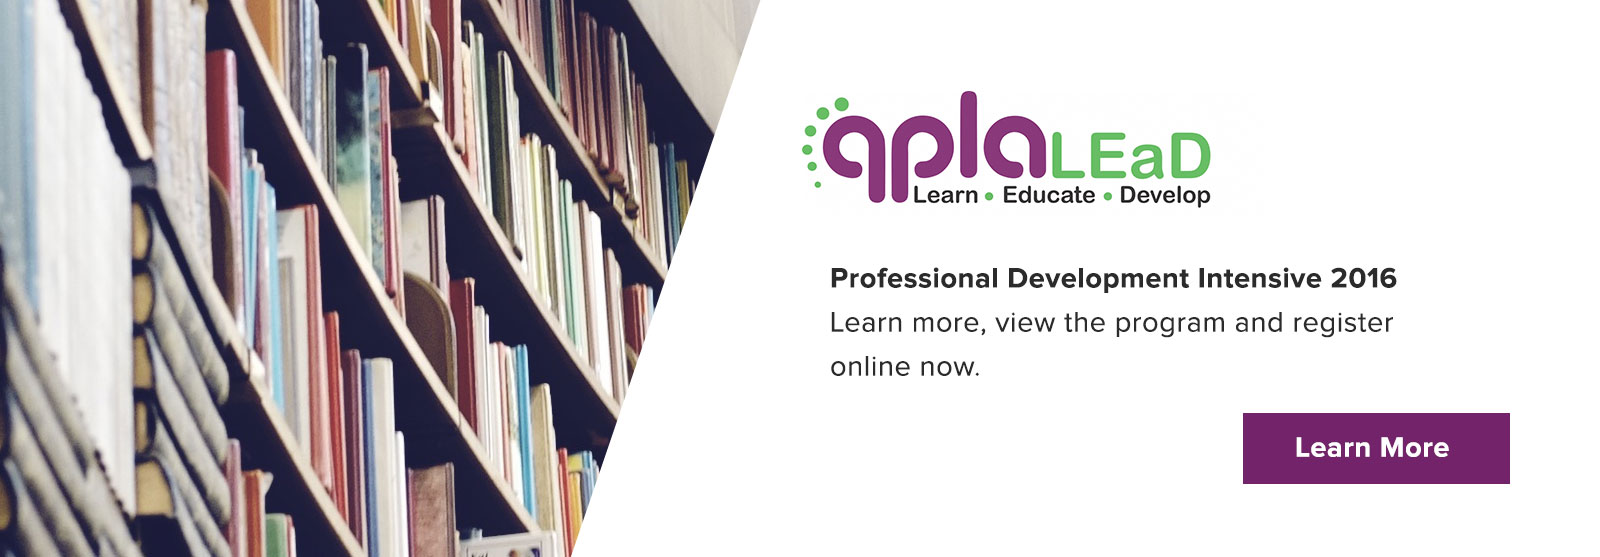 QPLA PD Intensive 2016